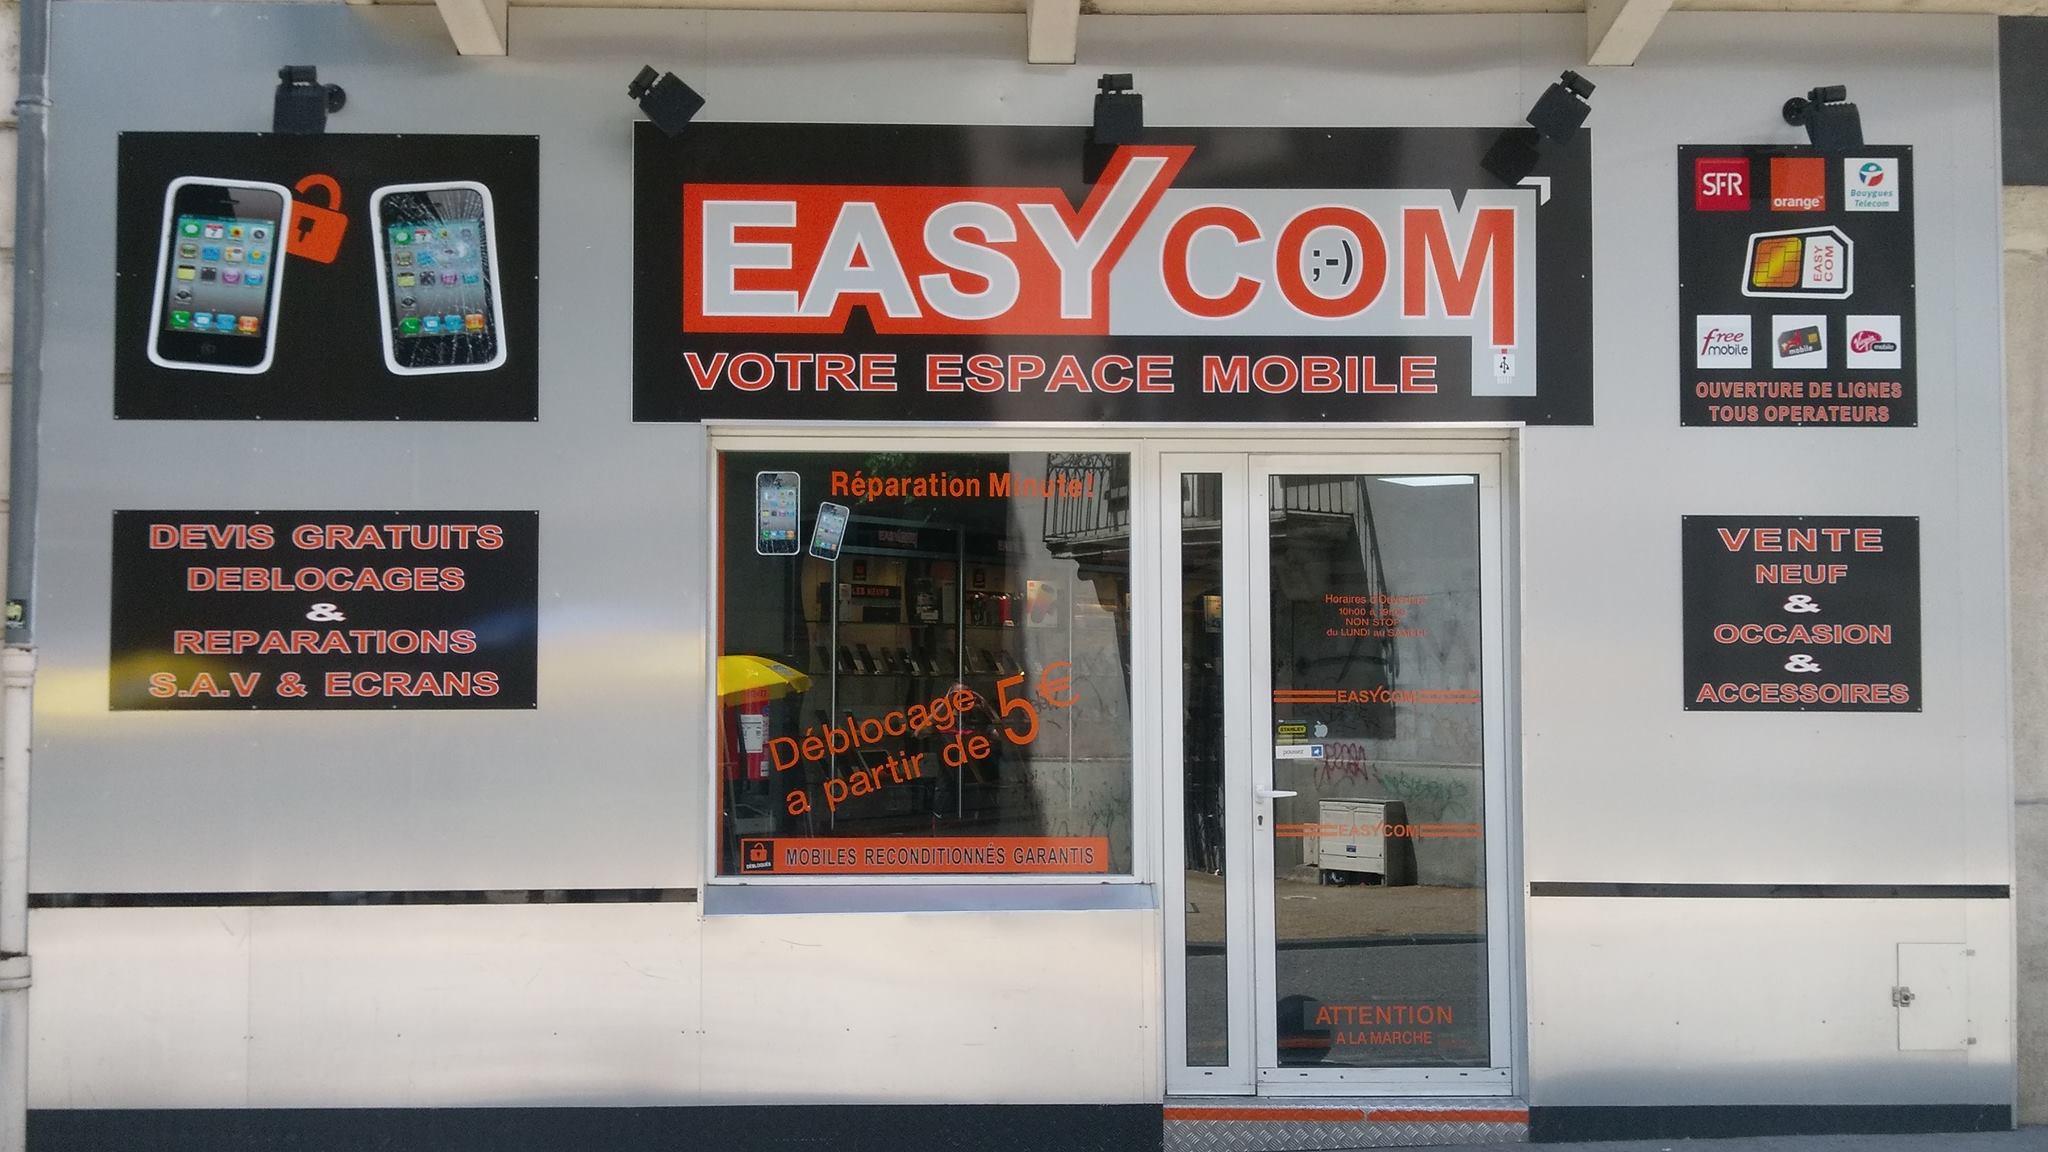 EASYCOM